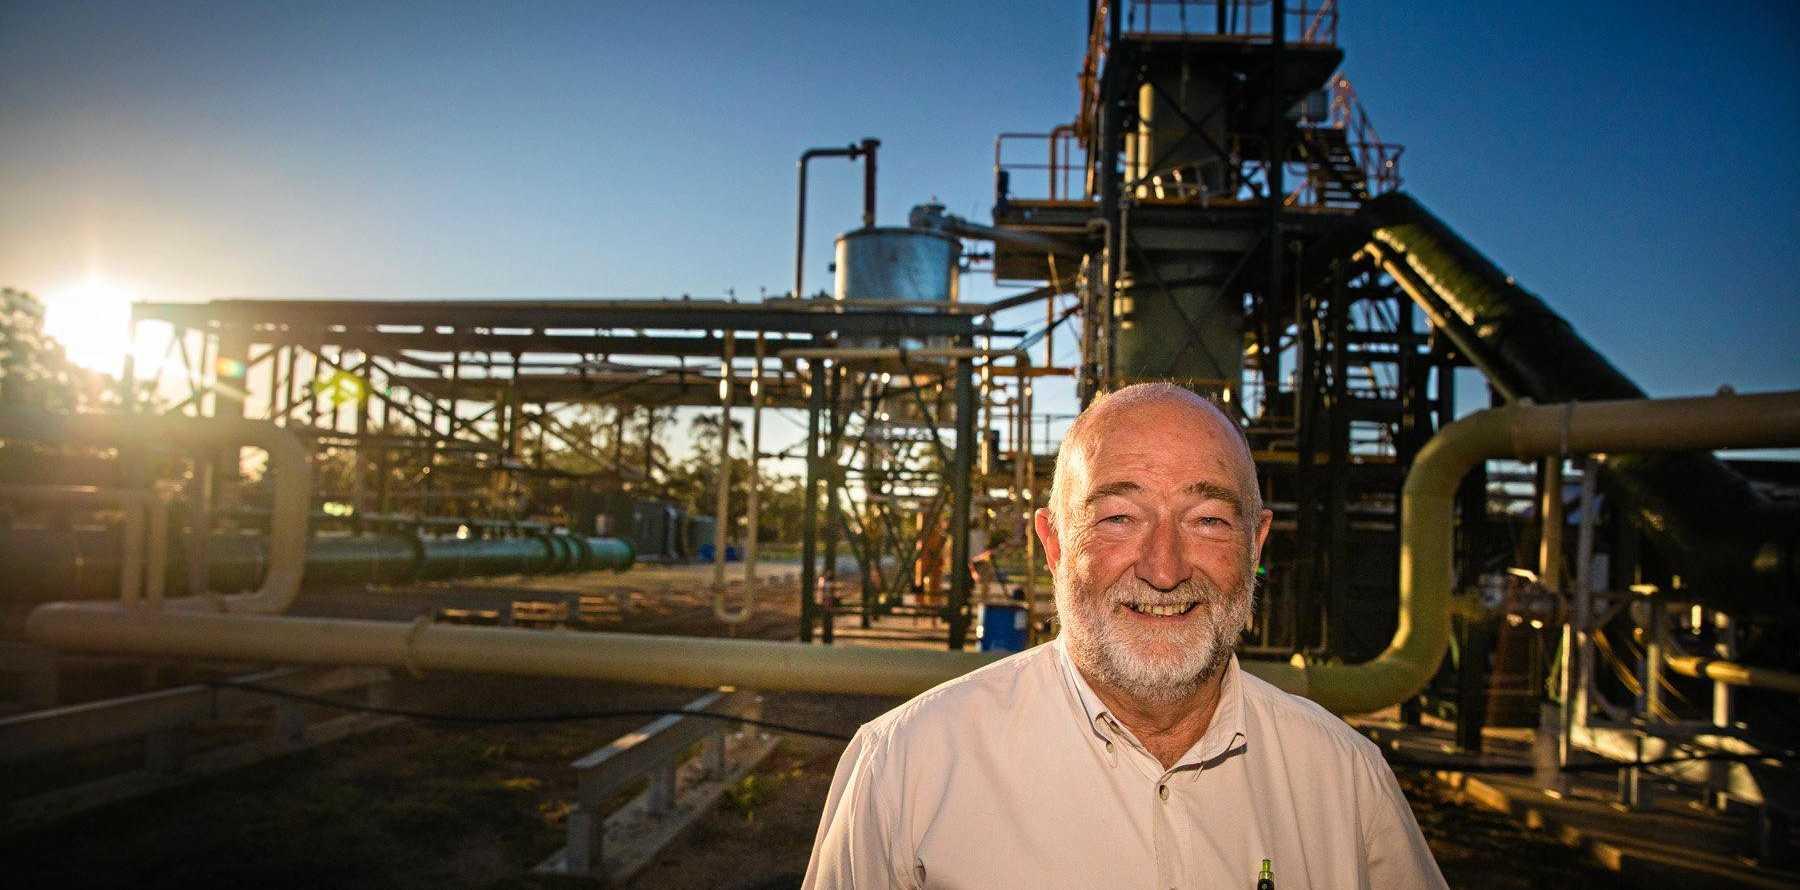 BURNING RUBBER: Green Distillation Technologies COO Trevor Bayley will speak at the event.